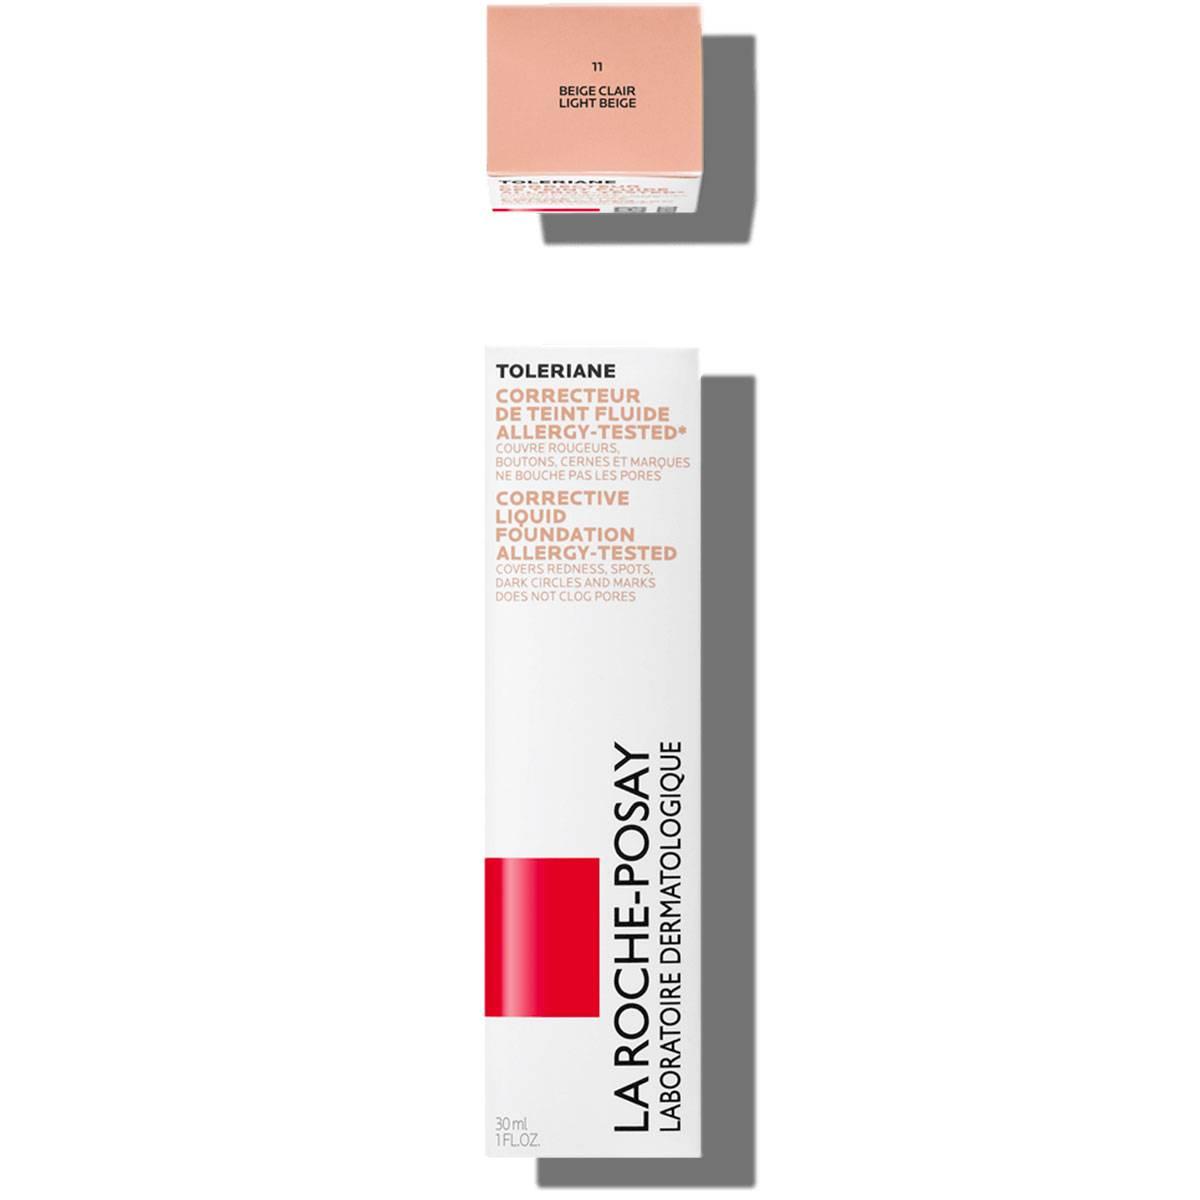 Toleriane Makeup CORRECTIVE LIQUID FOUNDATION 11 Light Beige   La Roche Posay